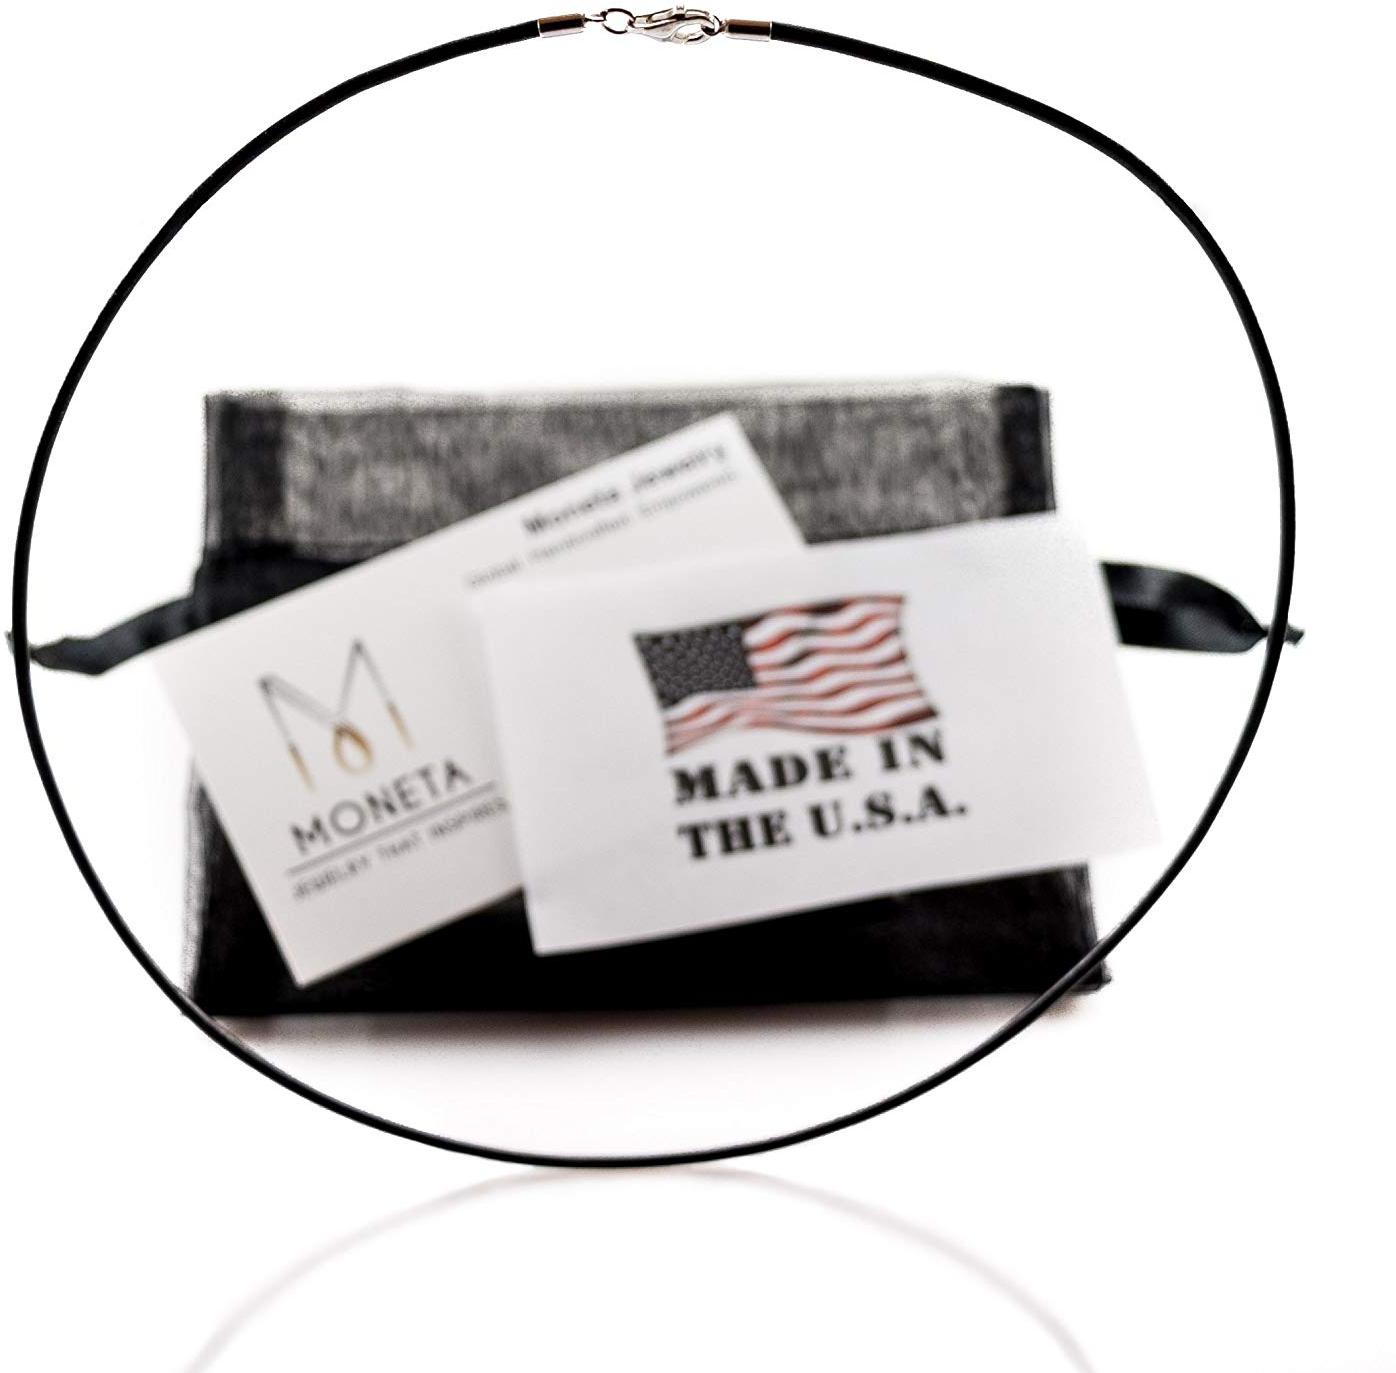 Moneta Black Genuine Greek Leather Cord Necklace, Sterling Silver Clasp, Multi-l